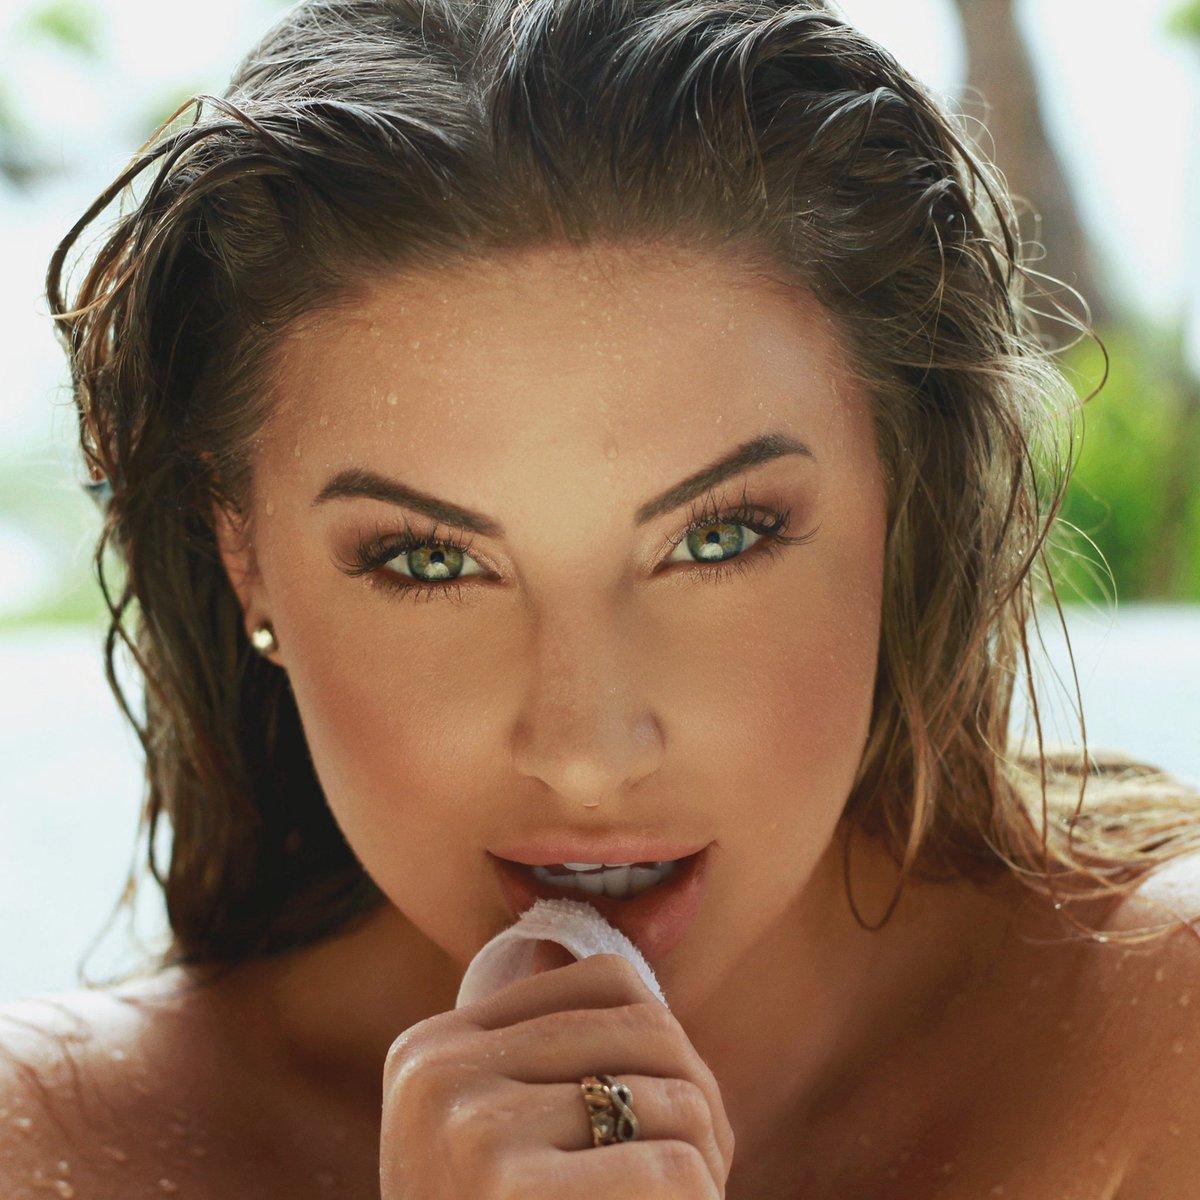 Ashley Alexiss (@AshAlexiss) 's Twitter Profile • TwiCopy